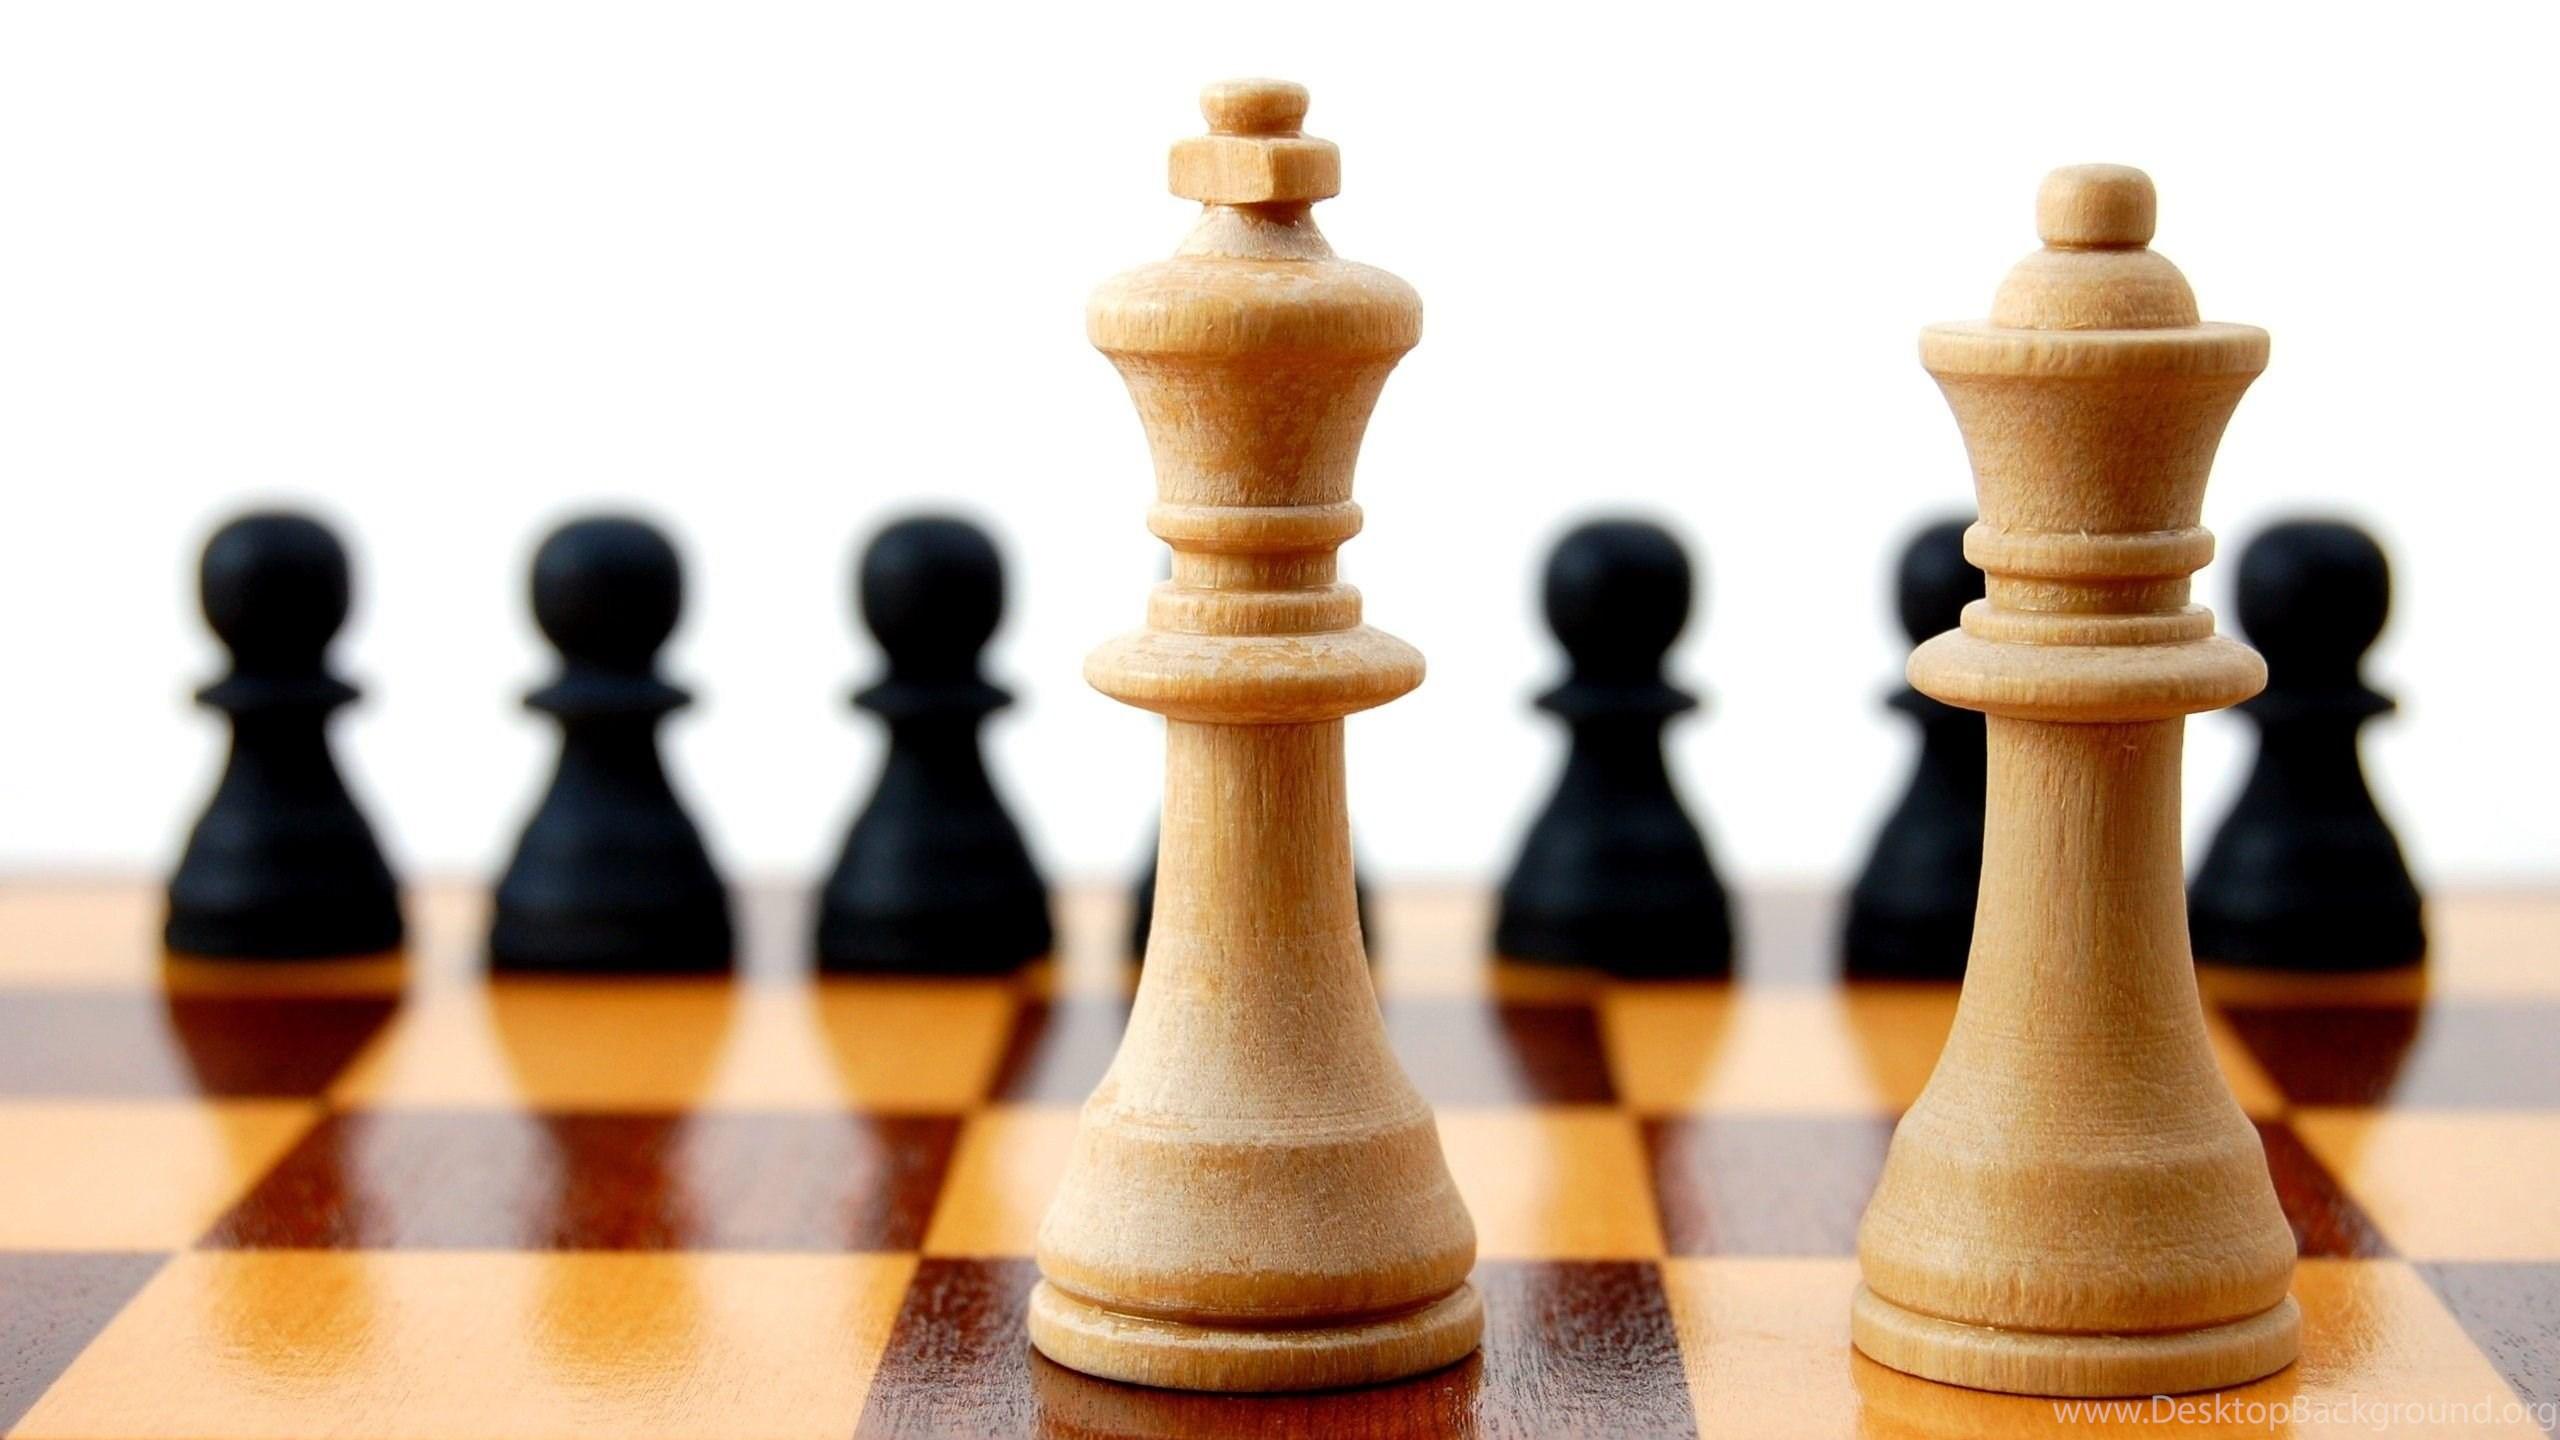 Chess board wallpaper desktop background netbook voltagebd Images